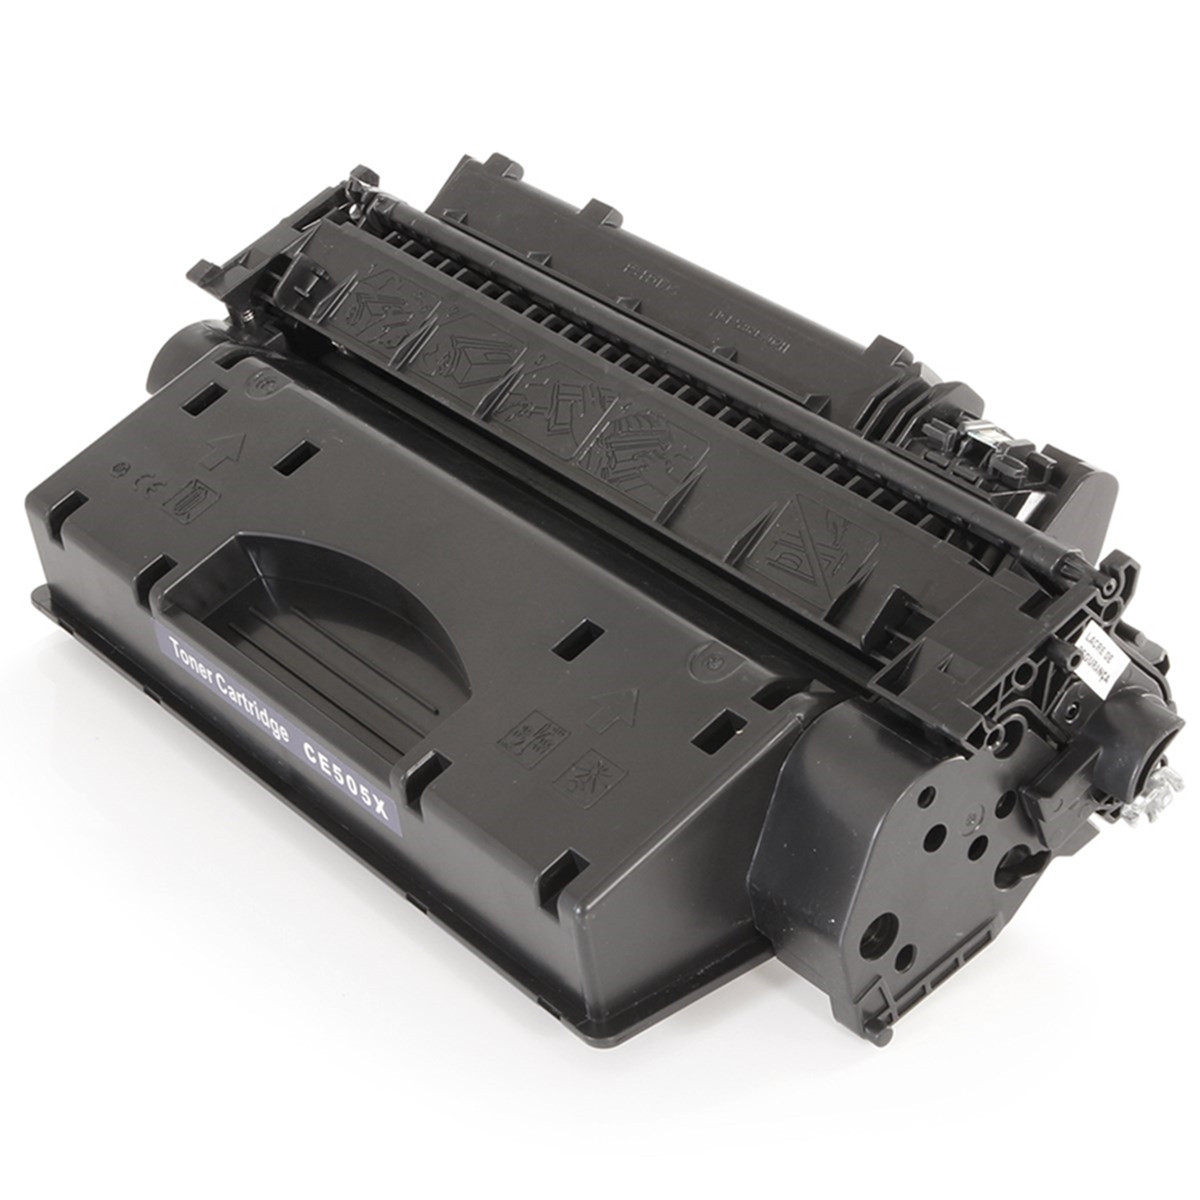 Toner Compatível com HP CE505X | P2055 P2055N P2055DN P2055X | Alto Rendimento | Premium 6.5k